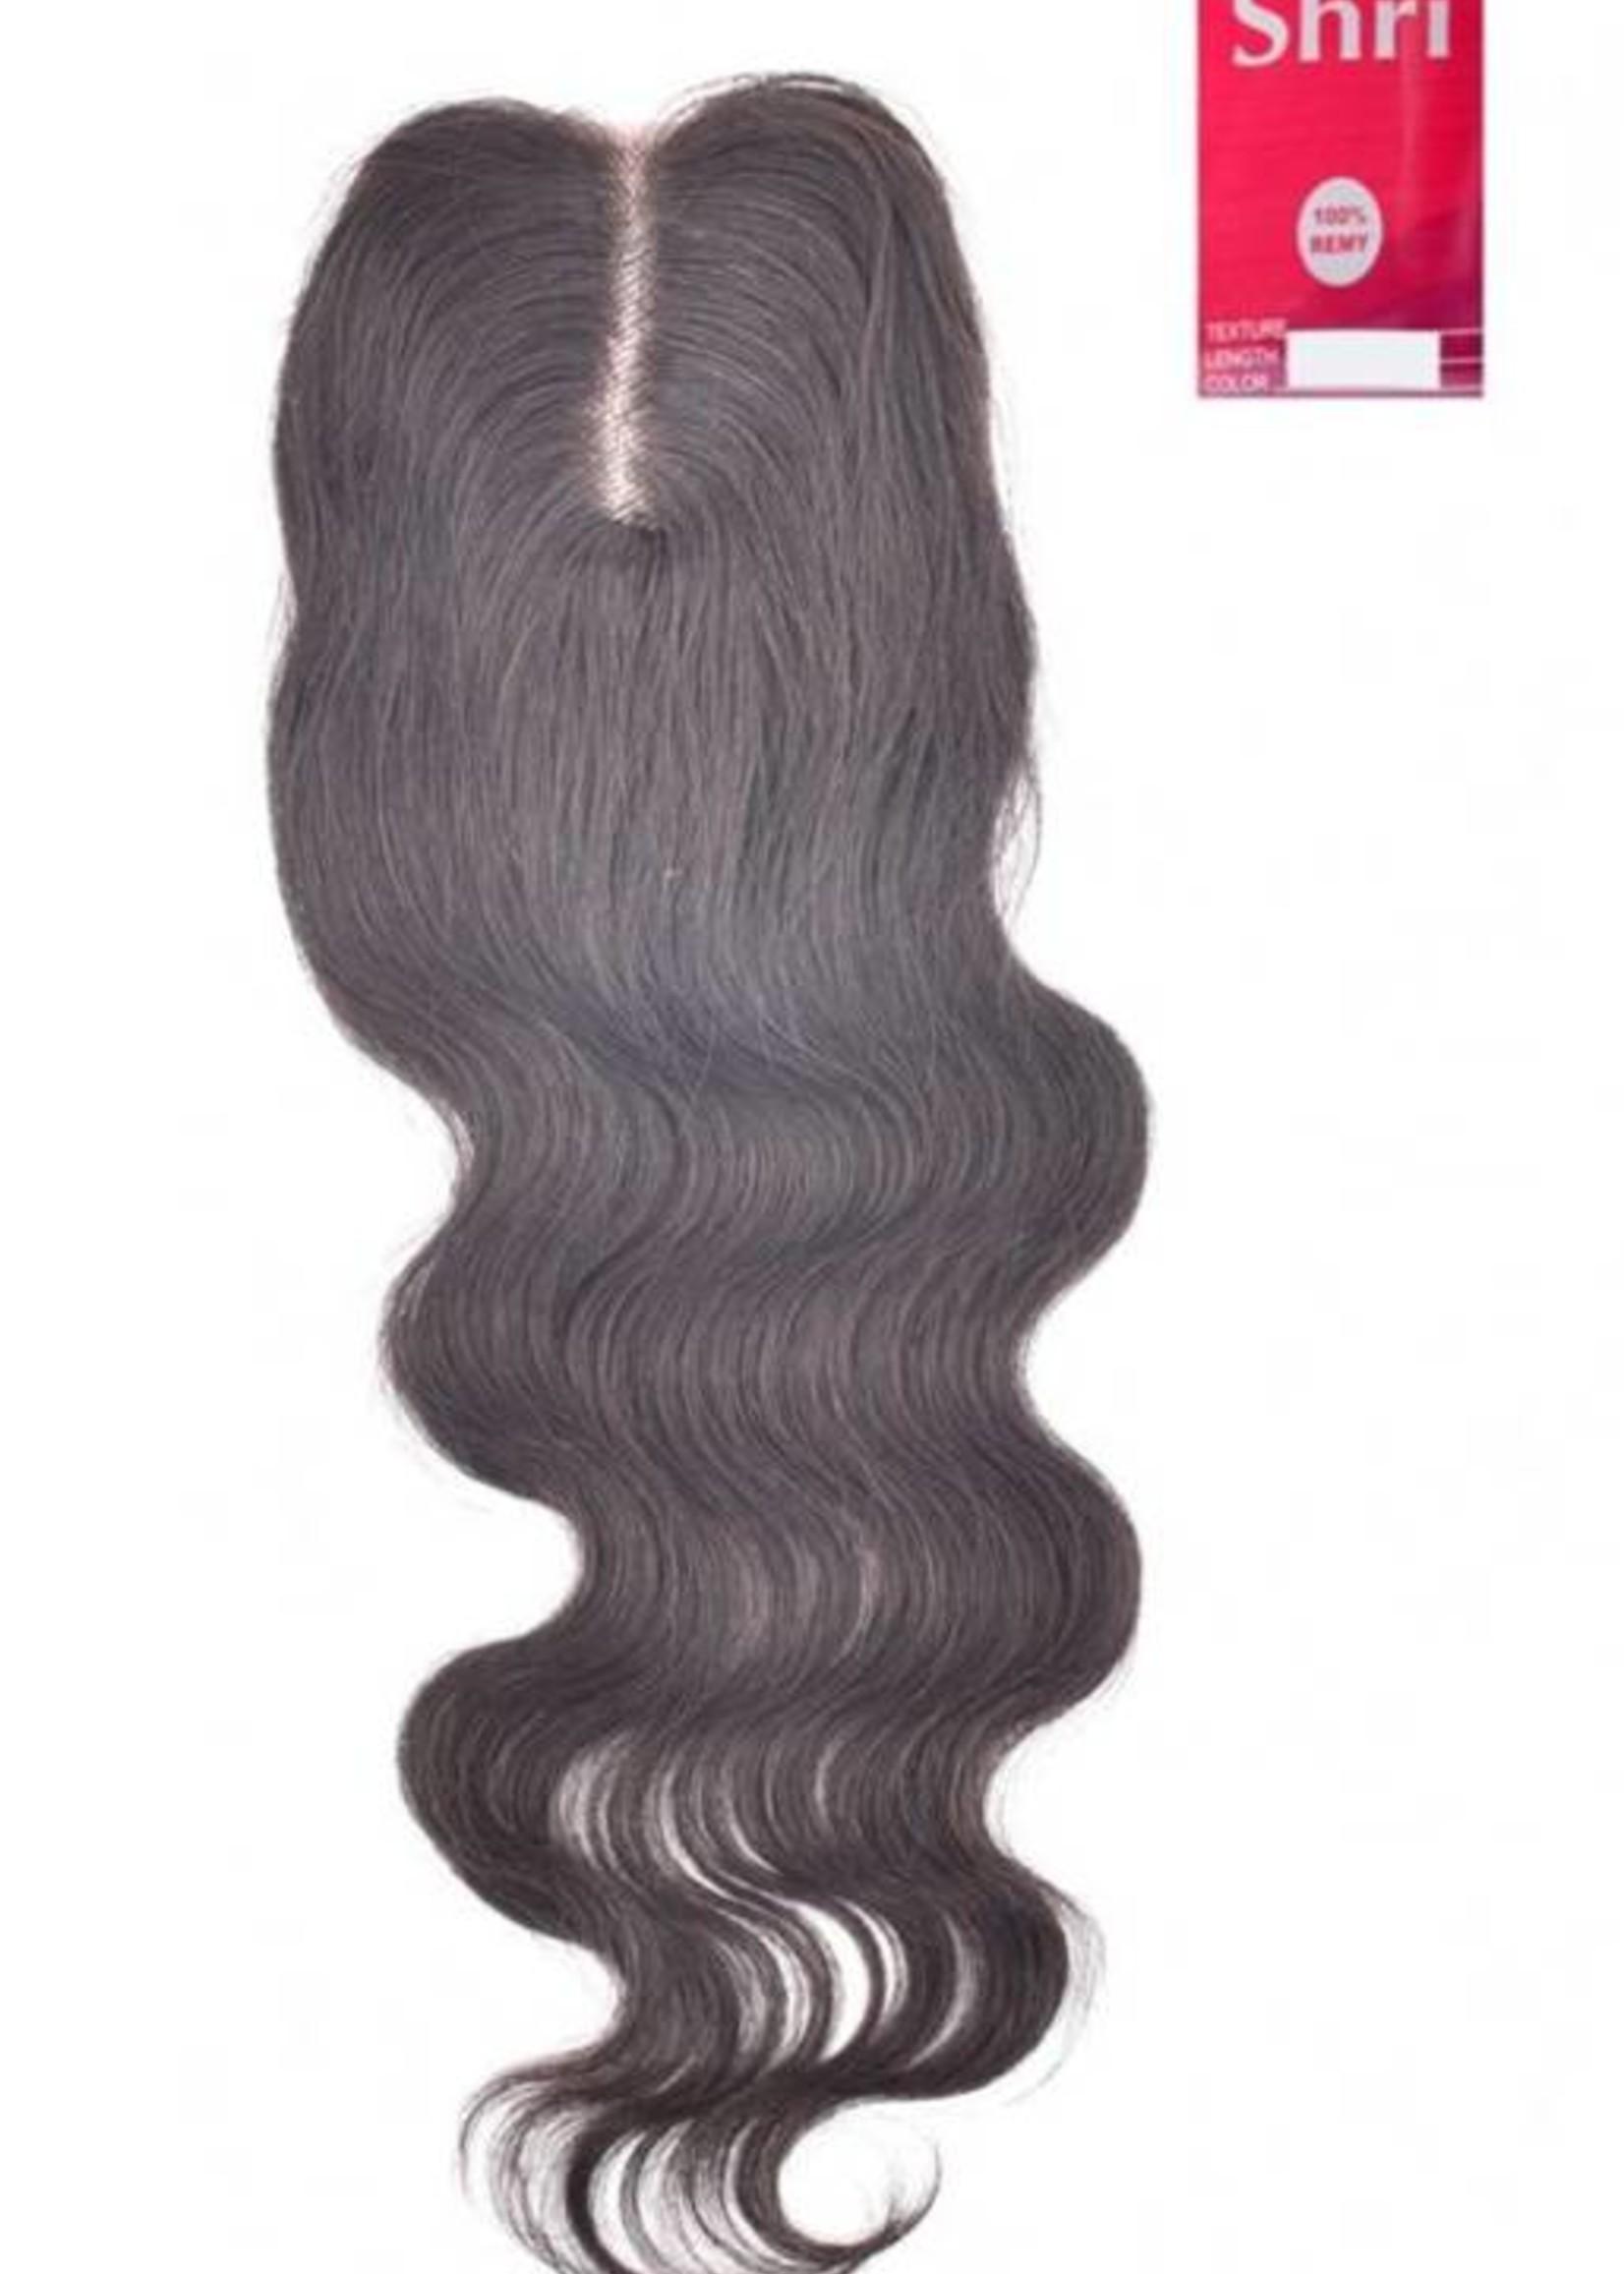 SHRI Indian (Shri) Human Hair Closure, 14 inch (Body Wave)